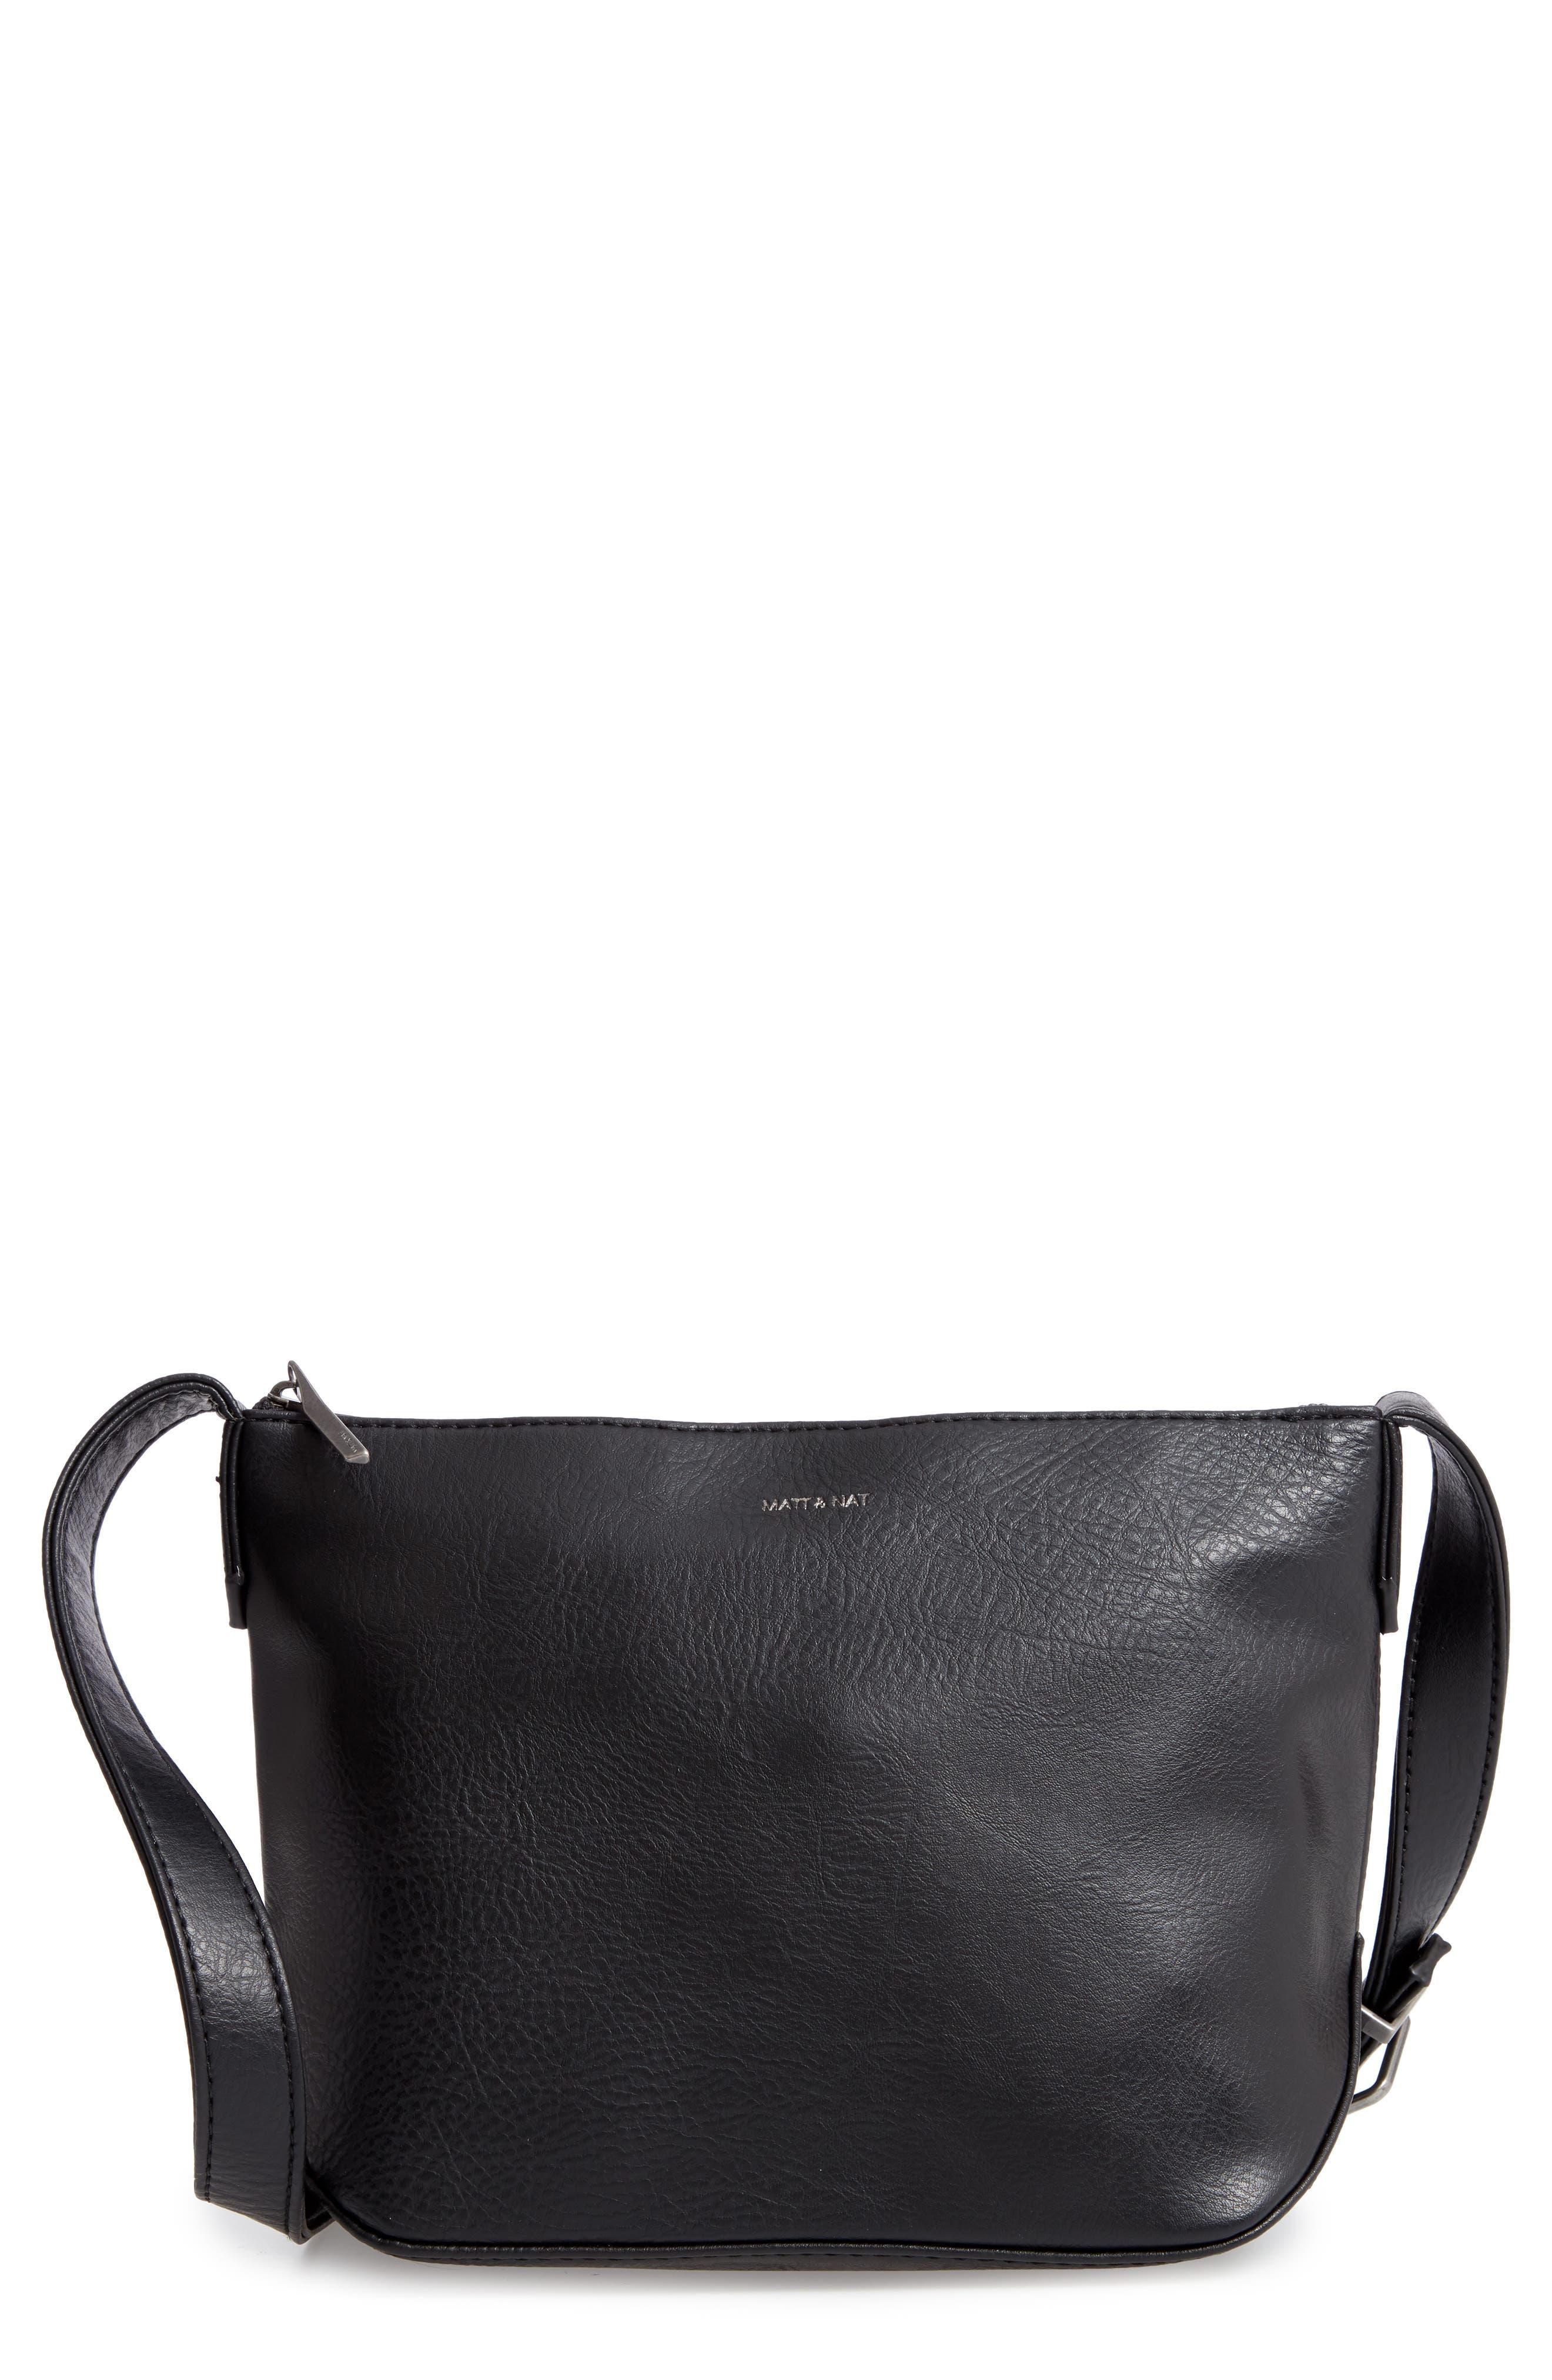 Matt & Nat Large Sam Faux Leather Crossbody Bag - Black